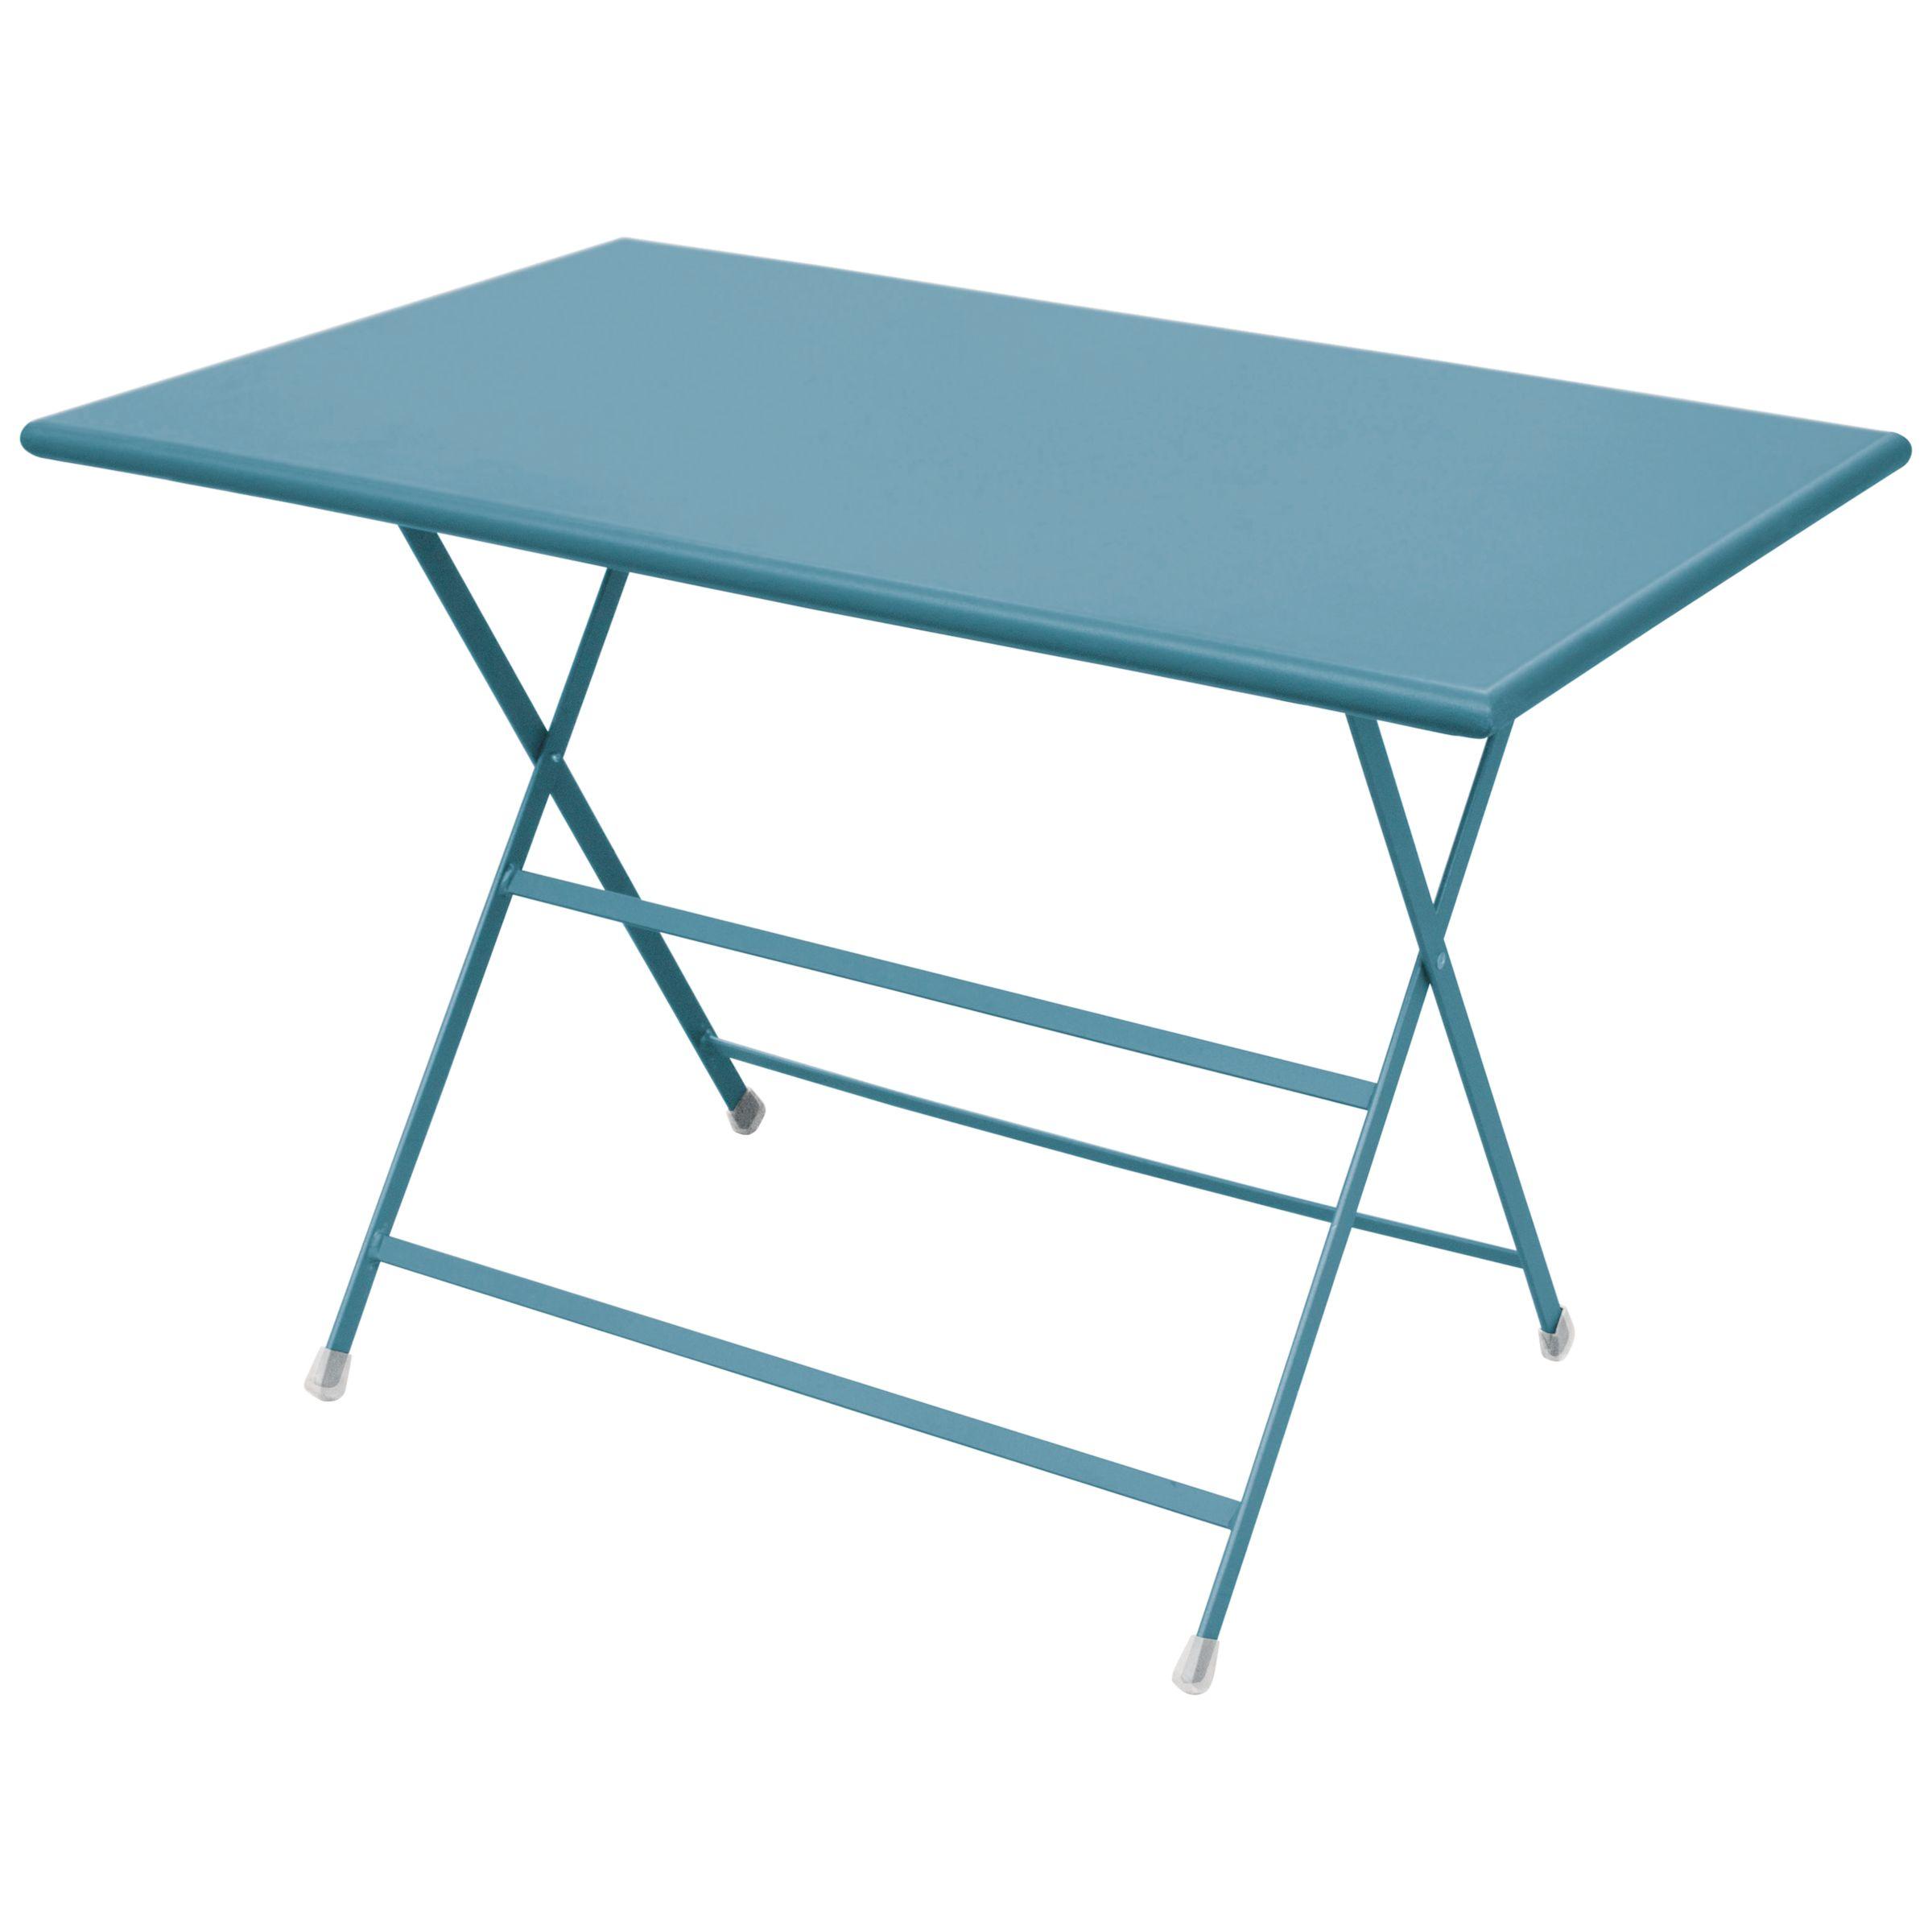 EMU Arc En Ciel Rectangular 4 Seater Outdoor Dining Tables